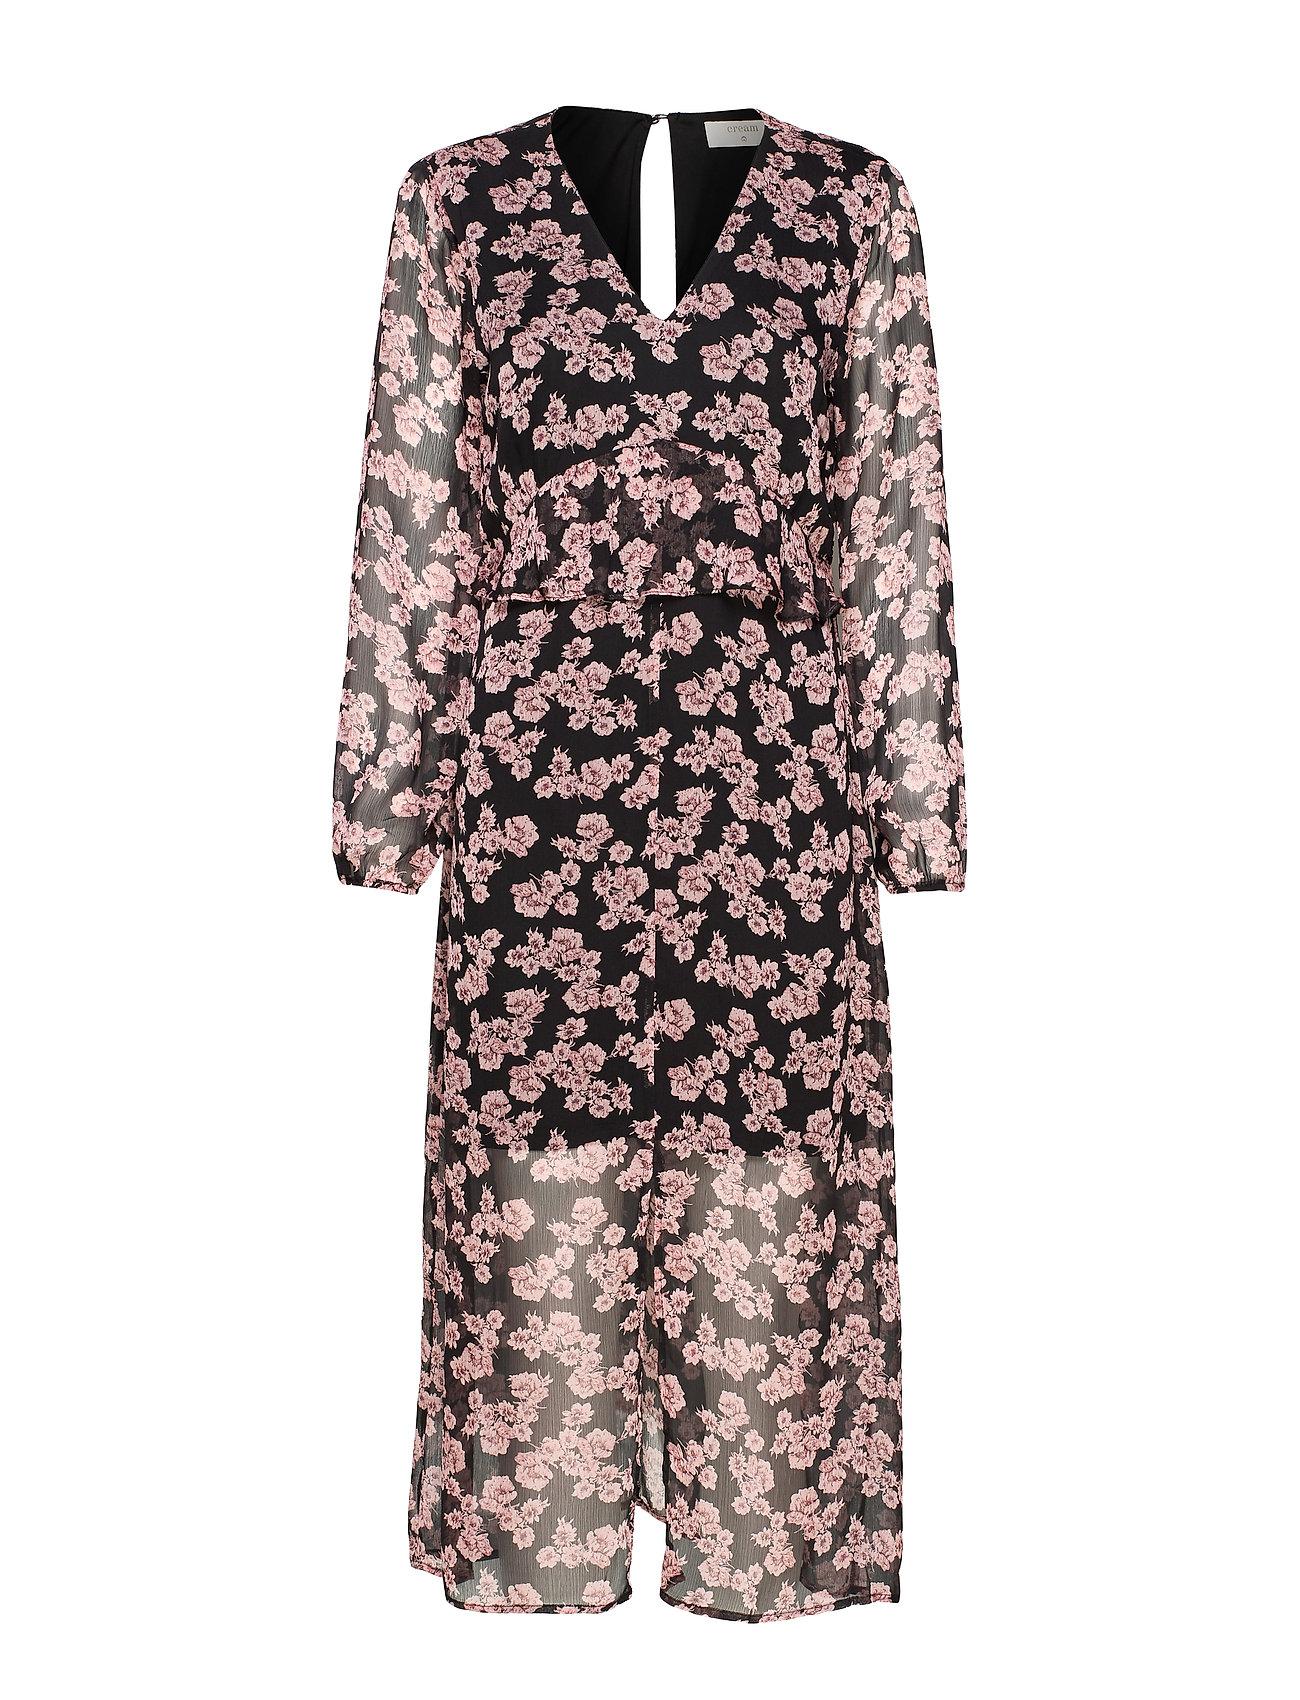 Cream JapaCR Dress - ALLOVER PRINT BLACK/ROSA